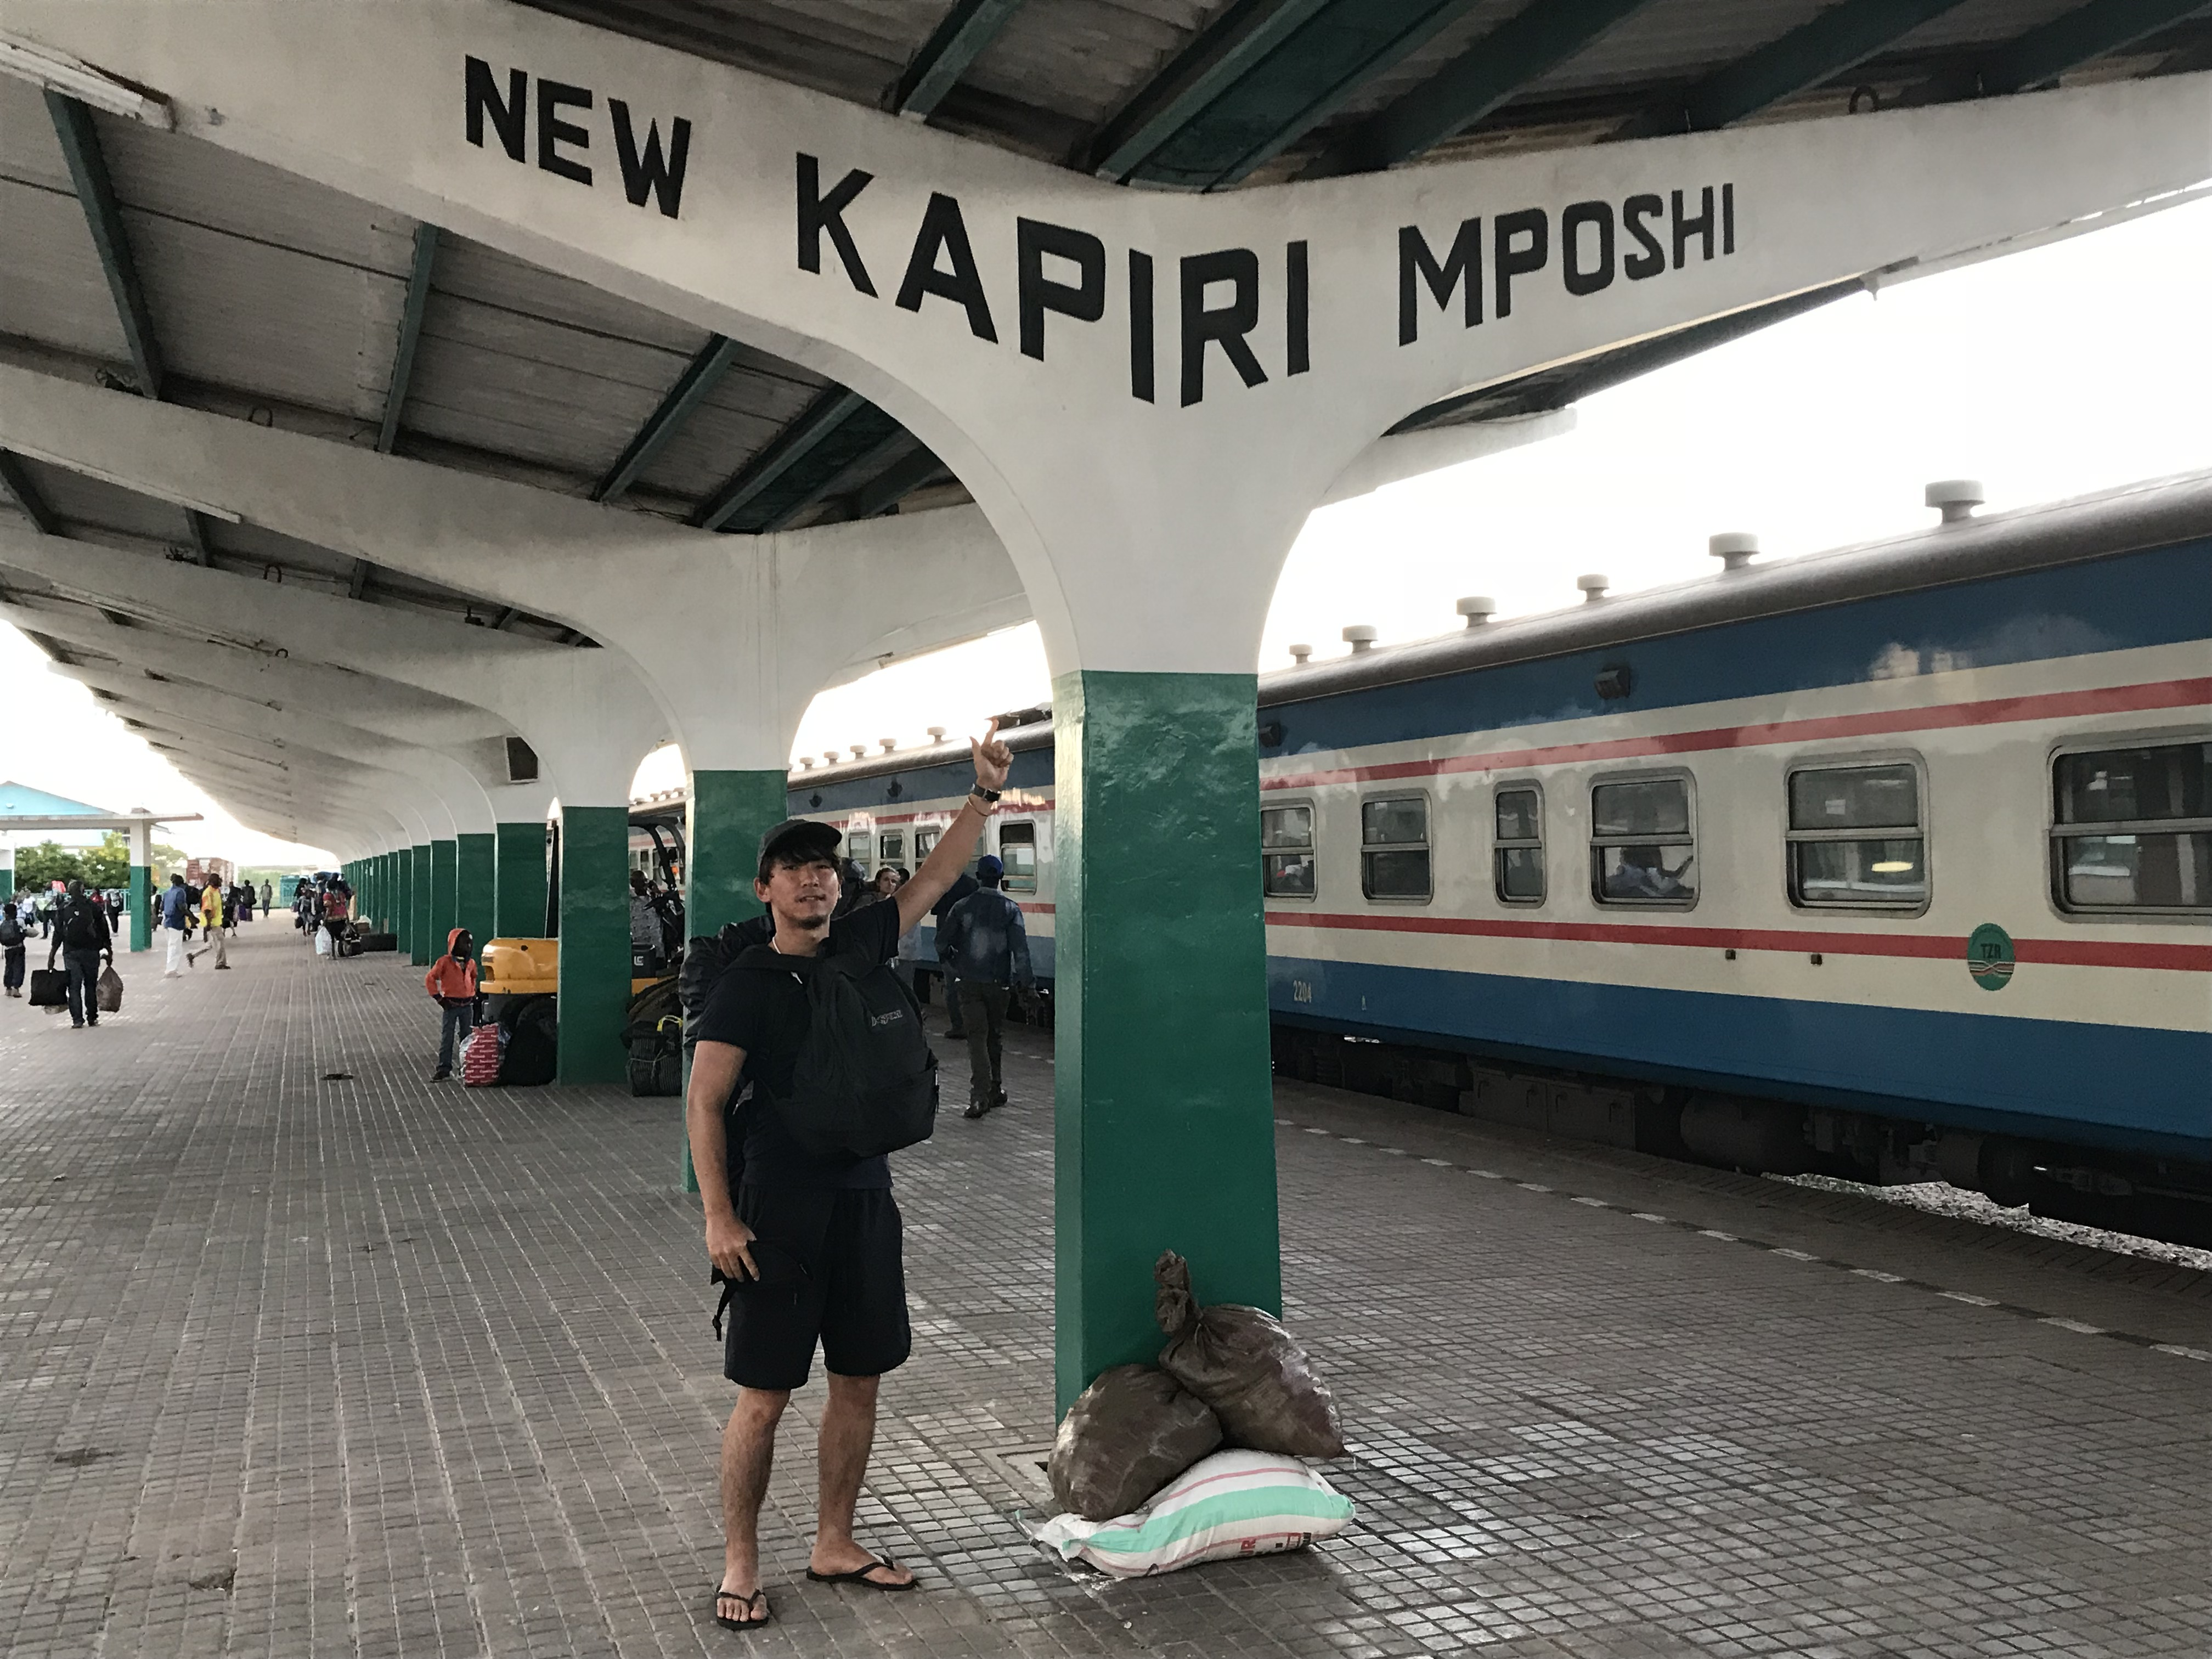 new kapiri mposhi